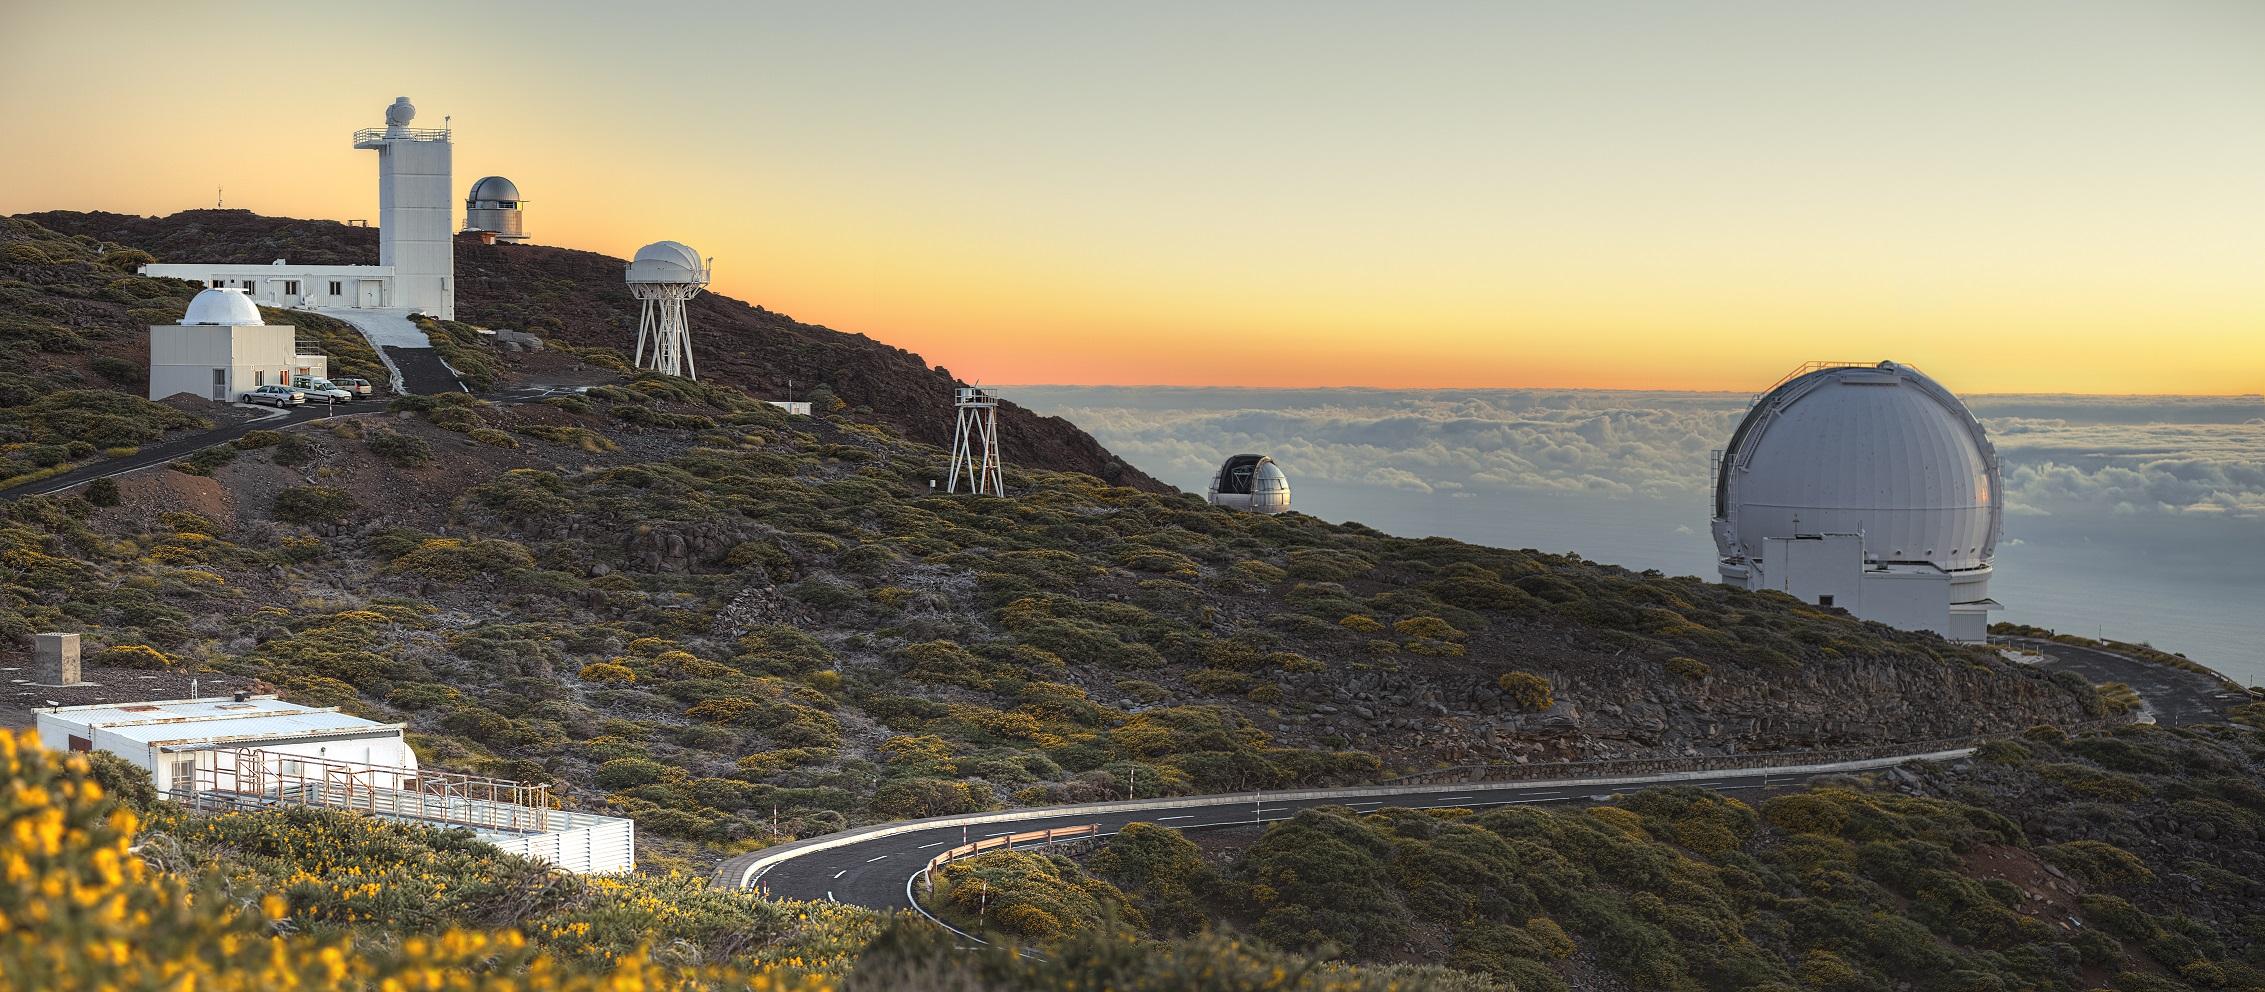 Besuchen Sie La Palma - Routen Roque de los Muchachos - West